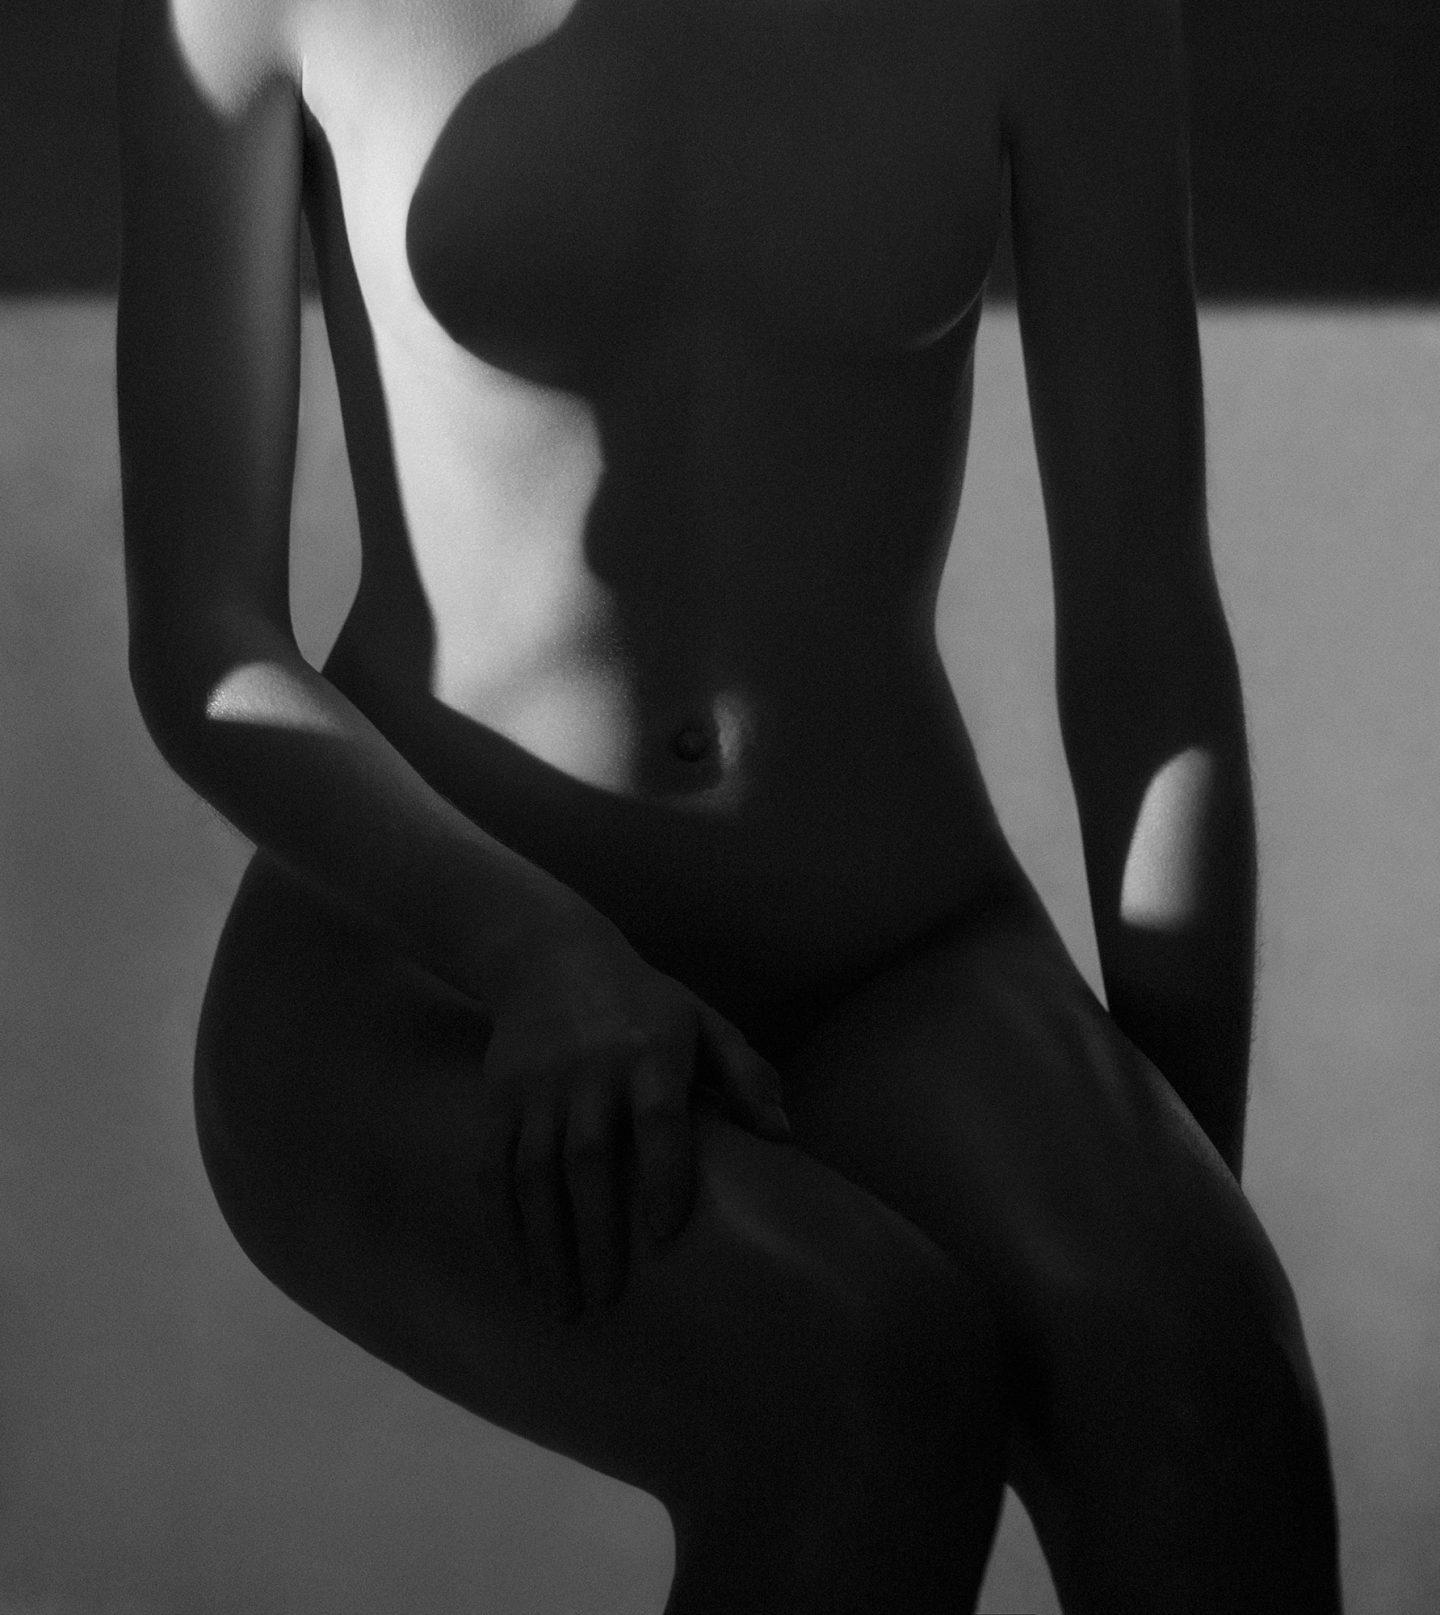 IGNANT-Photography-MarcusSchaefer-02